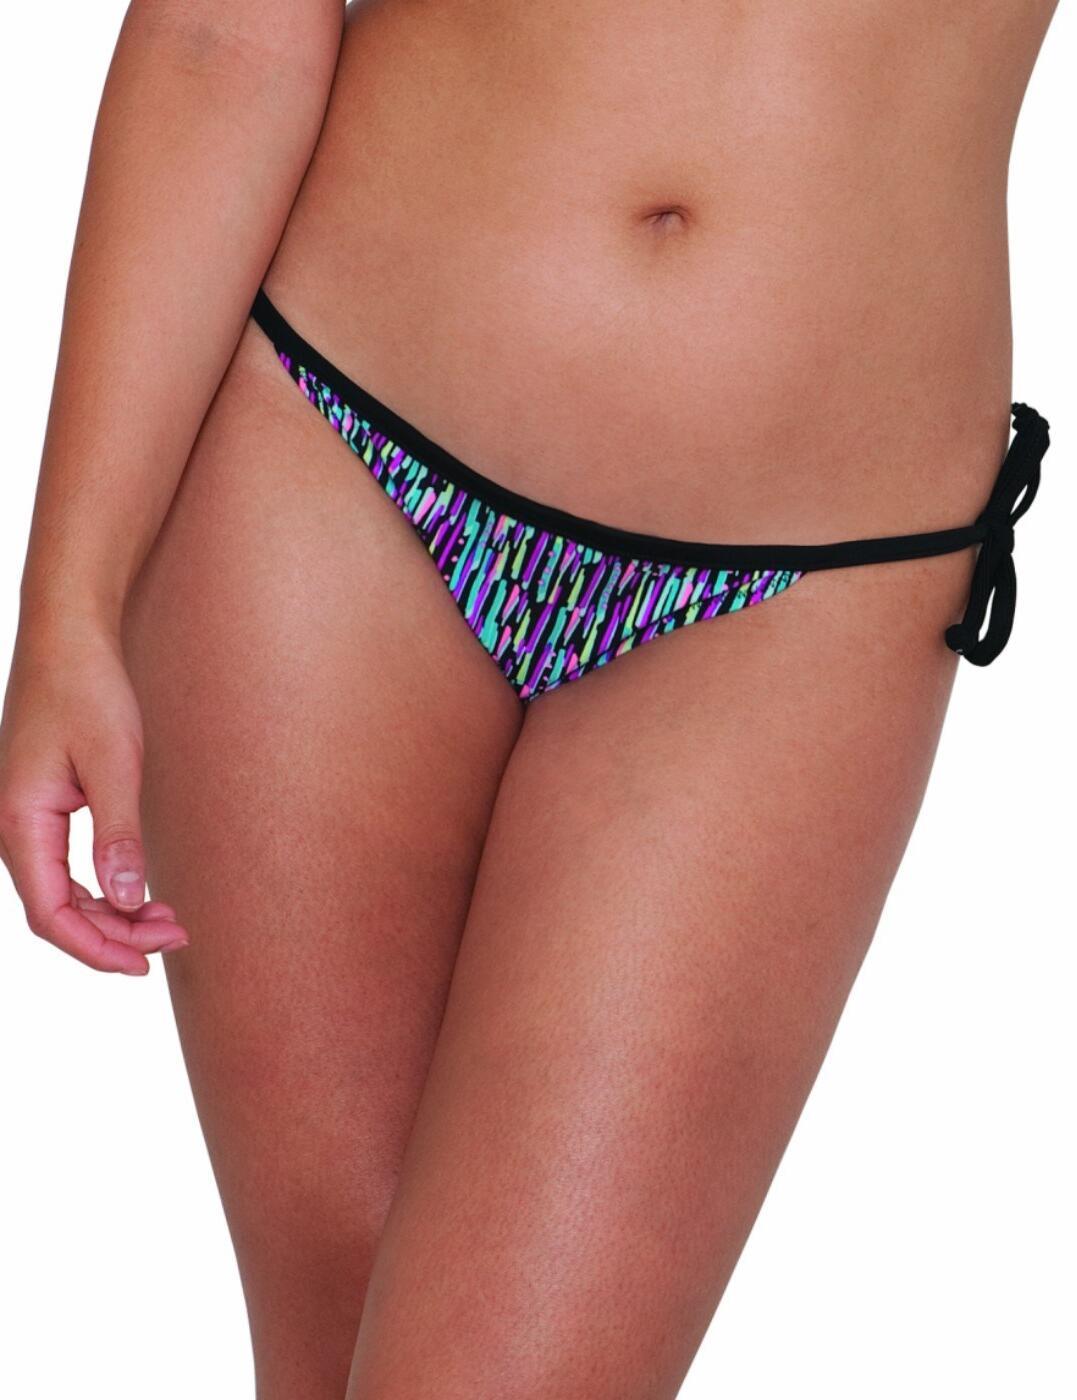 CS3715 Curvy Kate Galaxy Tie Side Bikini Brief - CS3715 Multi